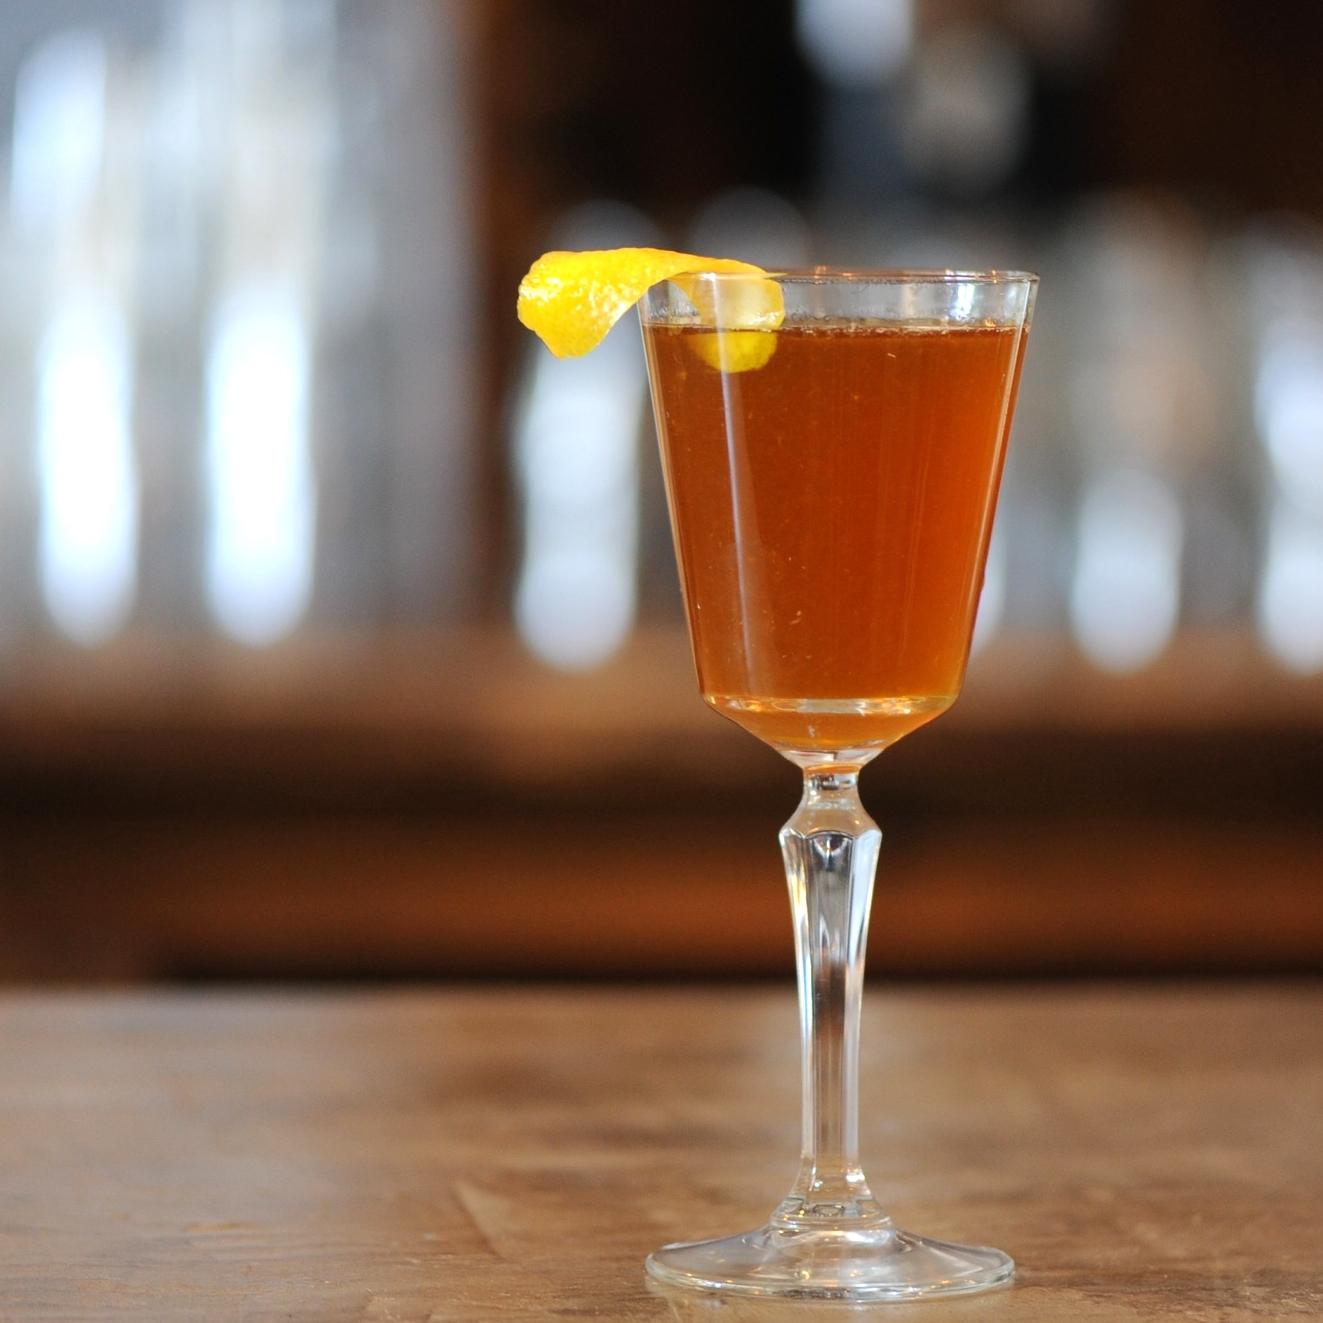 the-cocktail-experiment-syrups-madagascar-vanilla-brave-companion.jpg